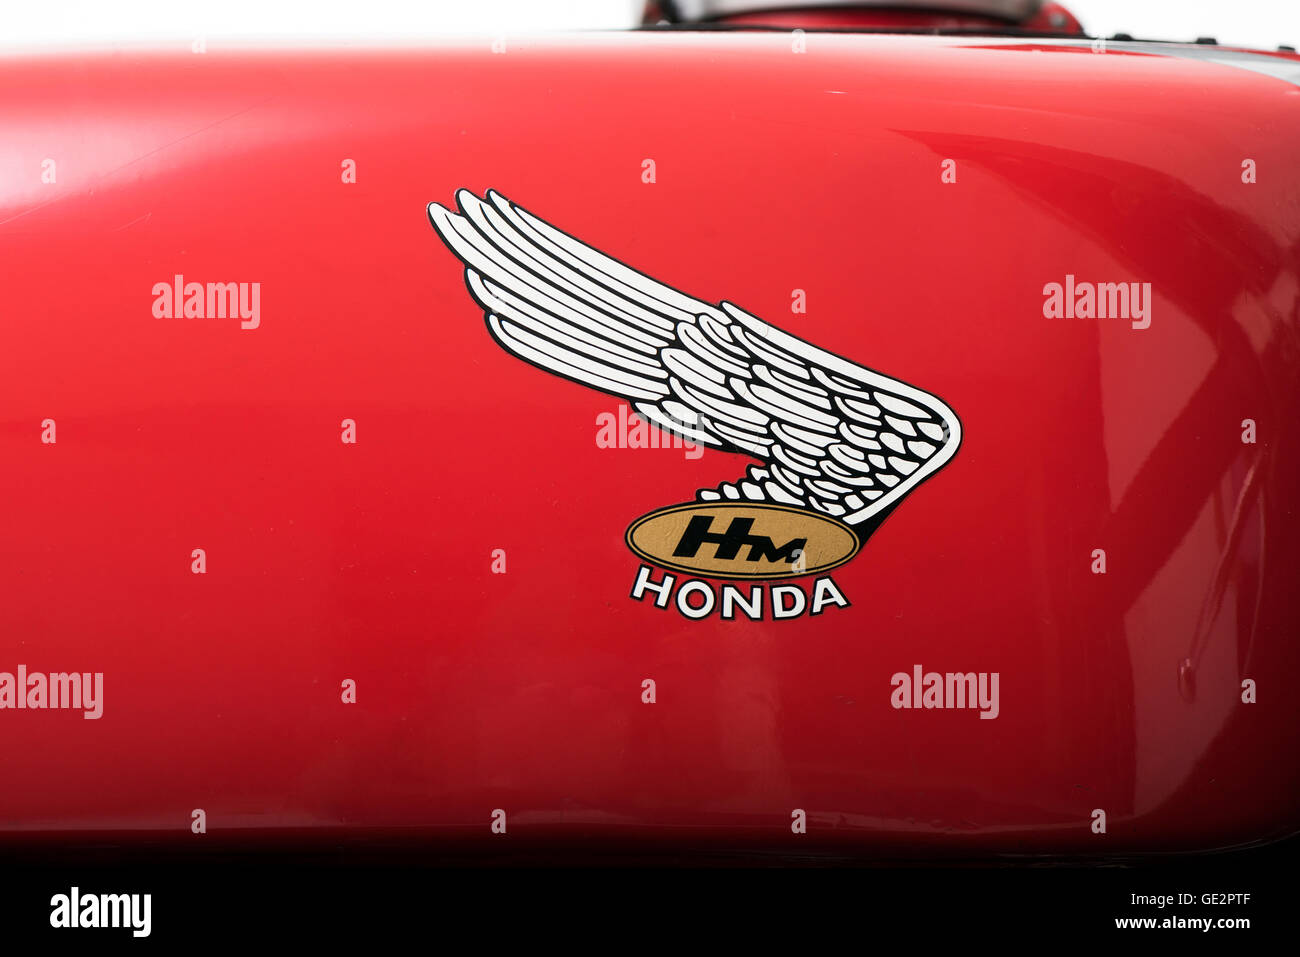 Honda rc162 rc 162 1961 250 four race motorcycle bike picture print - Honda Rc162 Rc 162 1961 250 Four Race Motorcycle Bike Picture Print 1961 Honda Rc162 Download